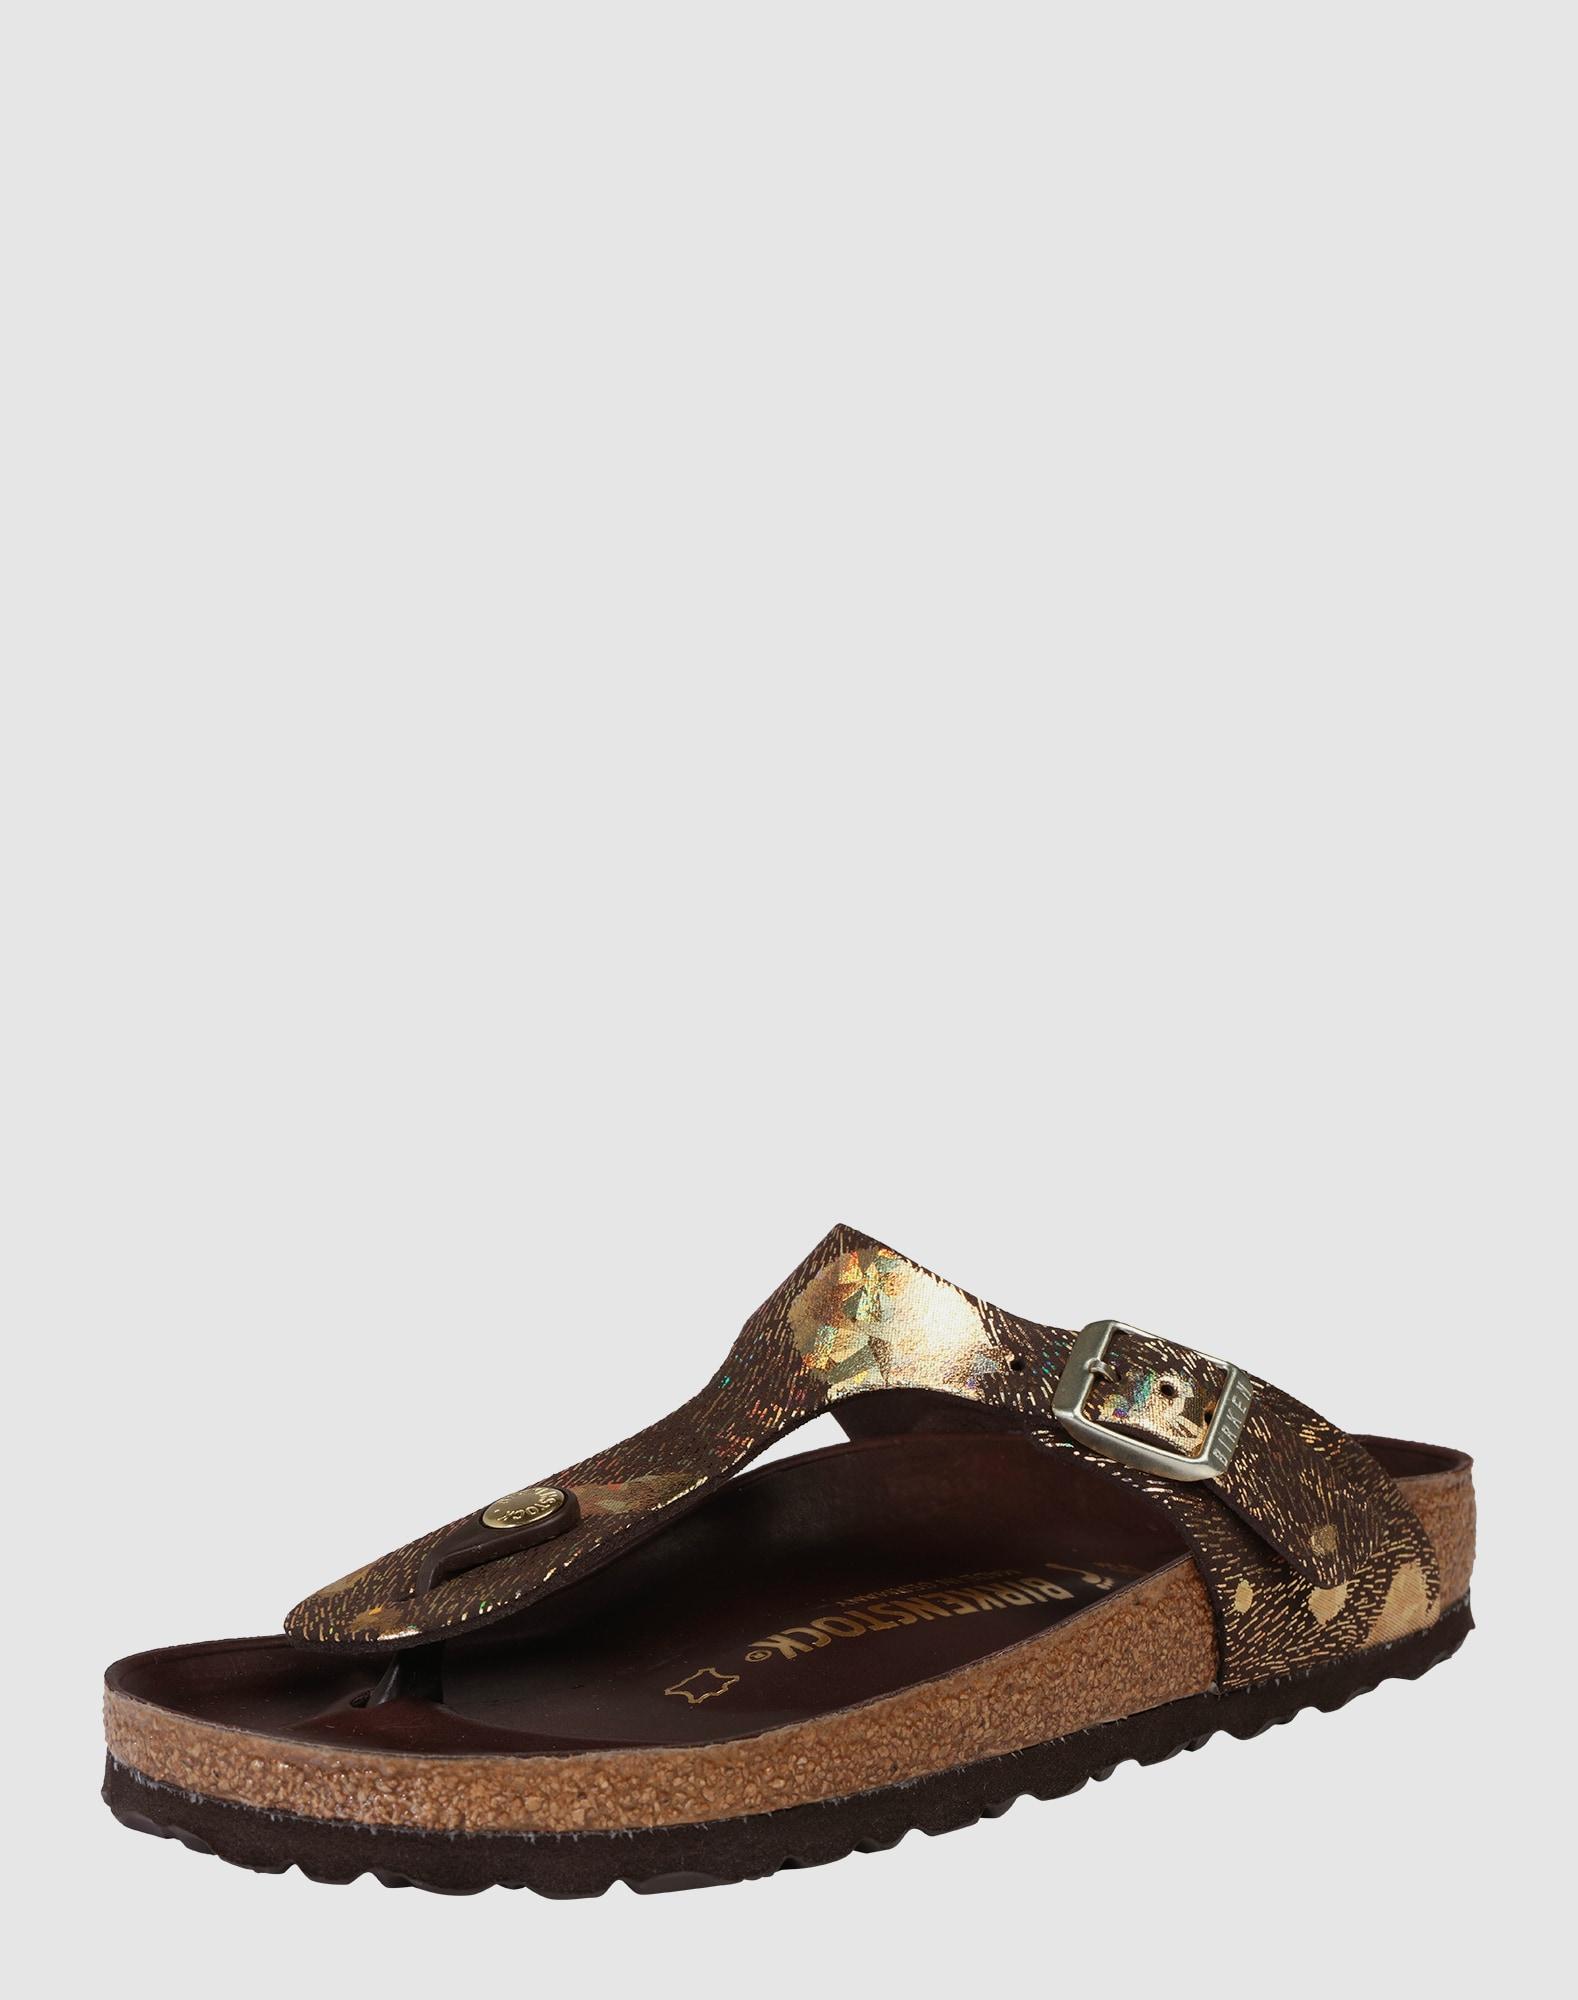 birkenstock sandale 39 gizeh 39 in braun about you. Black Bedroom Furniture Sets. Home Design Ideas